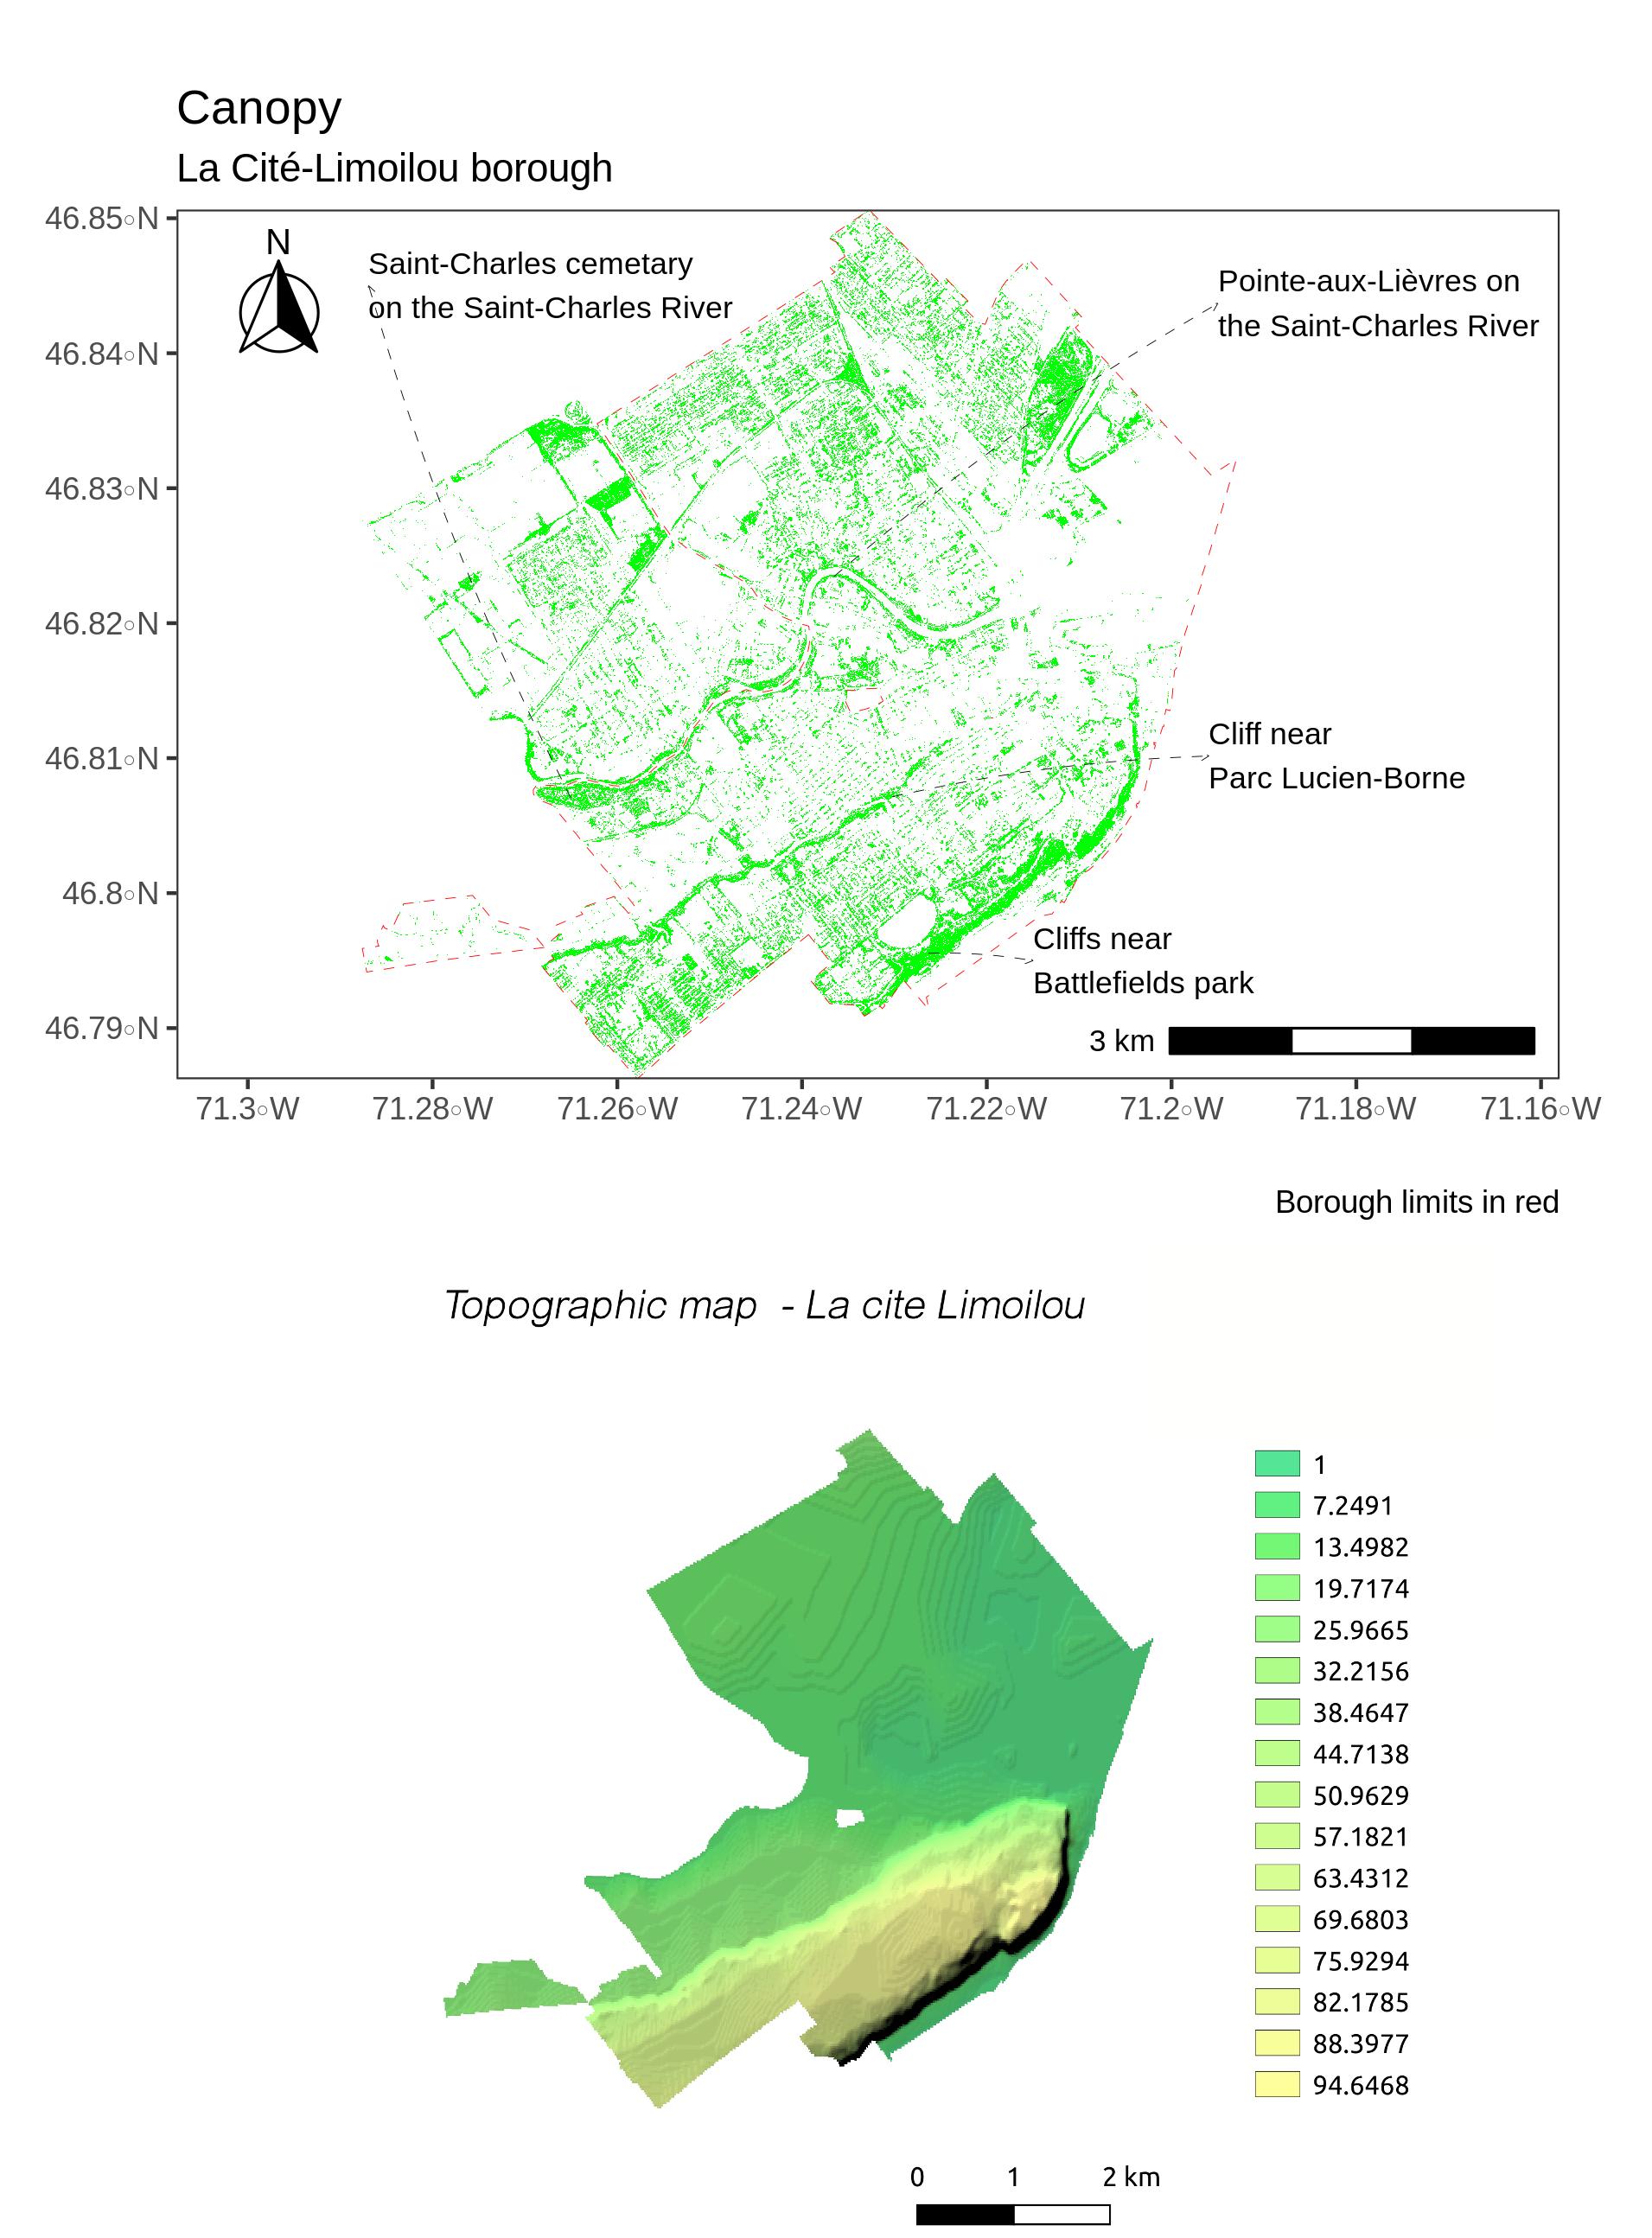 Canopy and topography - La Cite-Limoilou, Quebec City